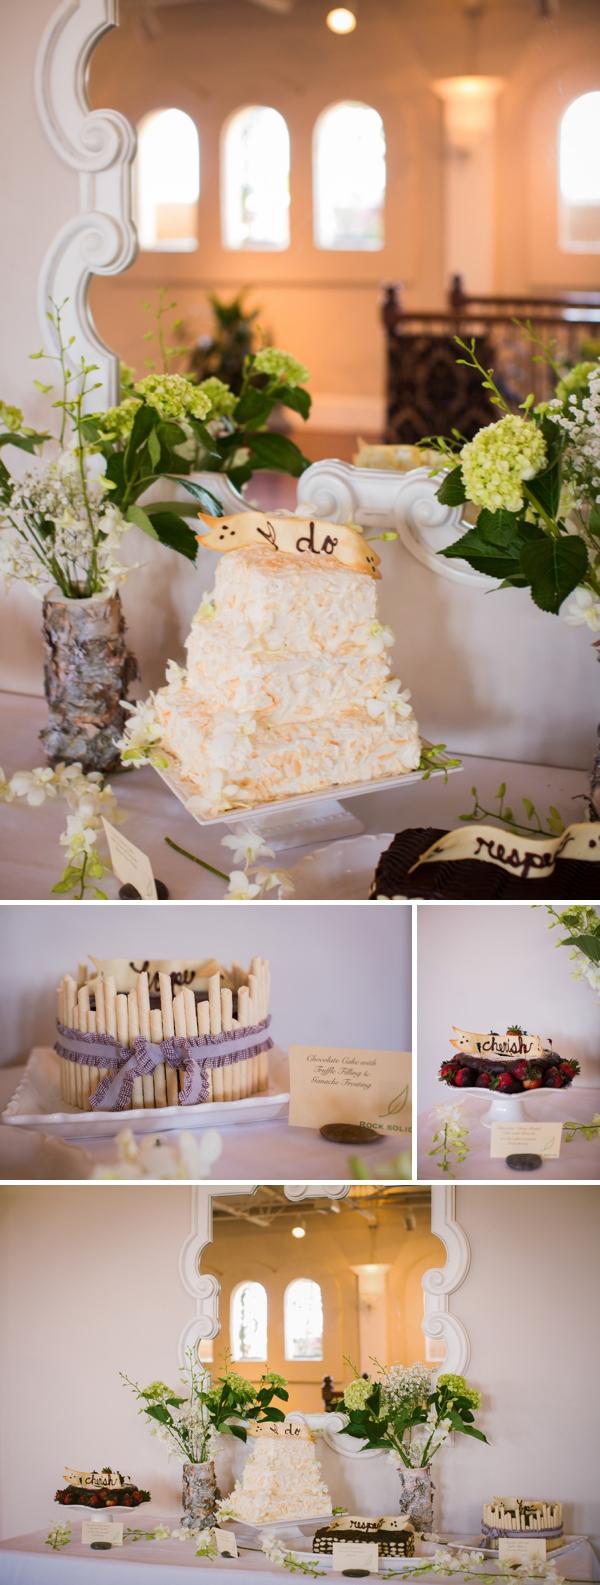 ST_Stephanie_W_Photography_beach_wedding_0034.jpg